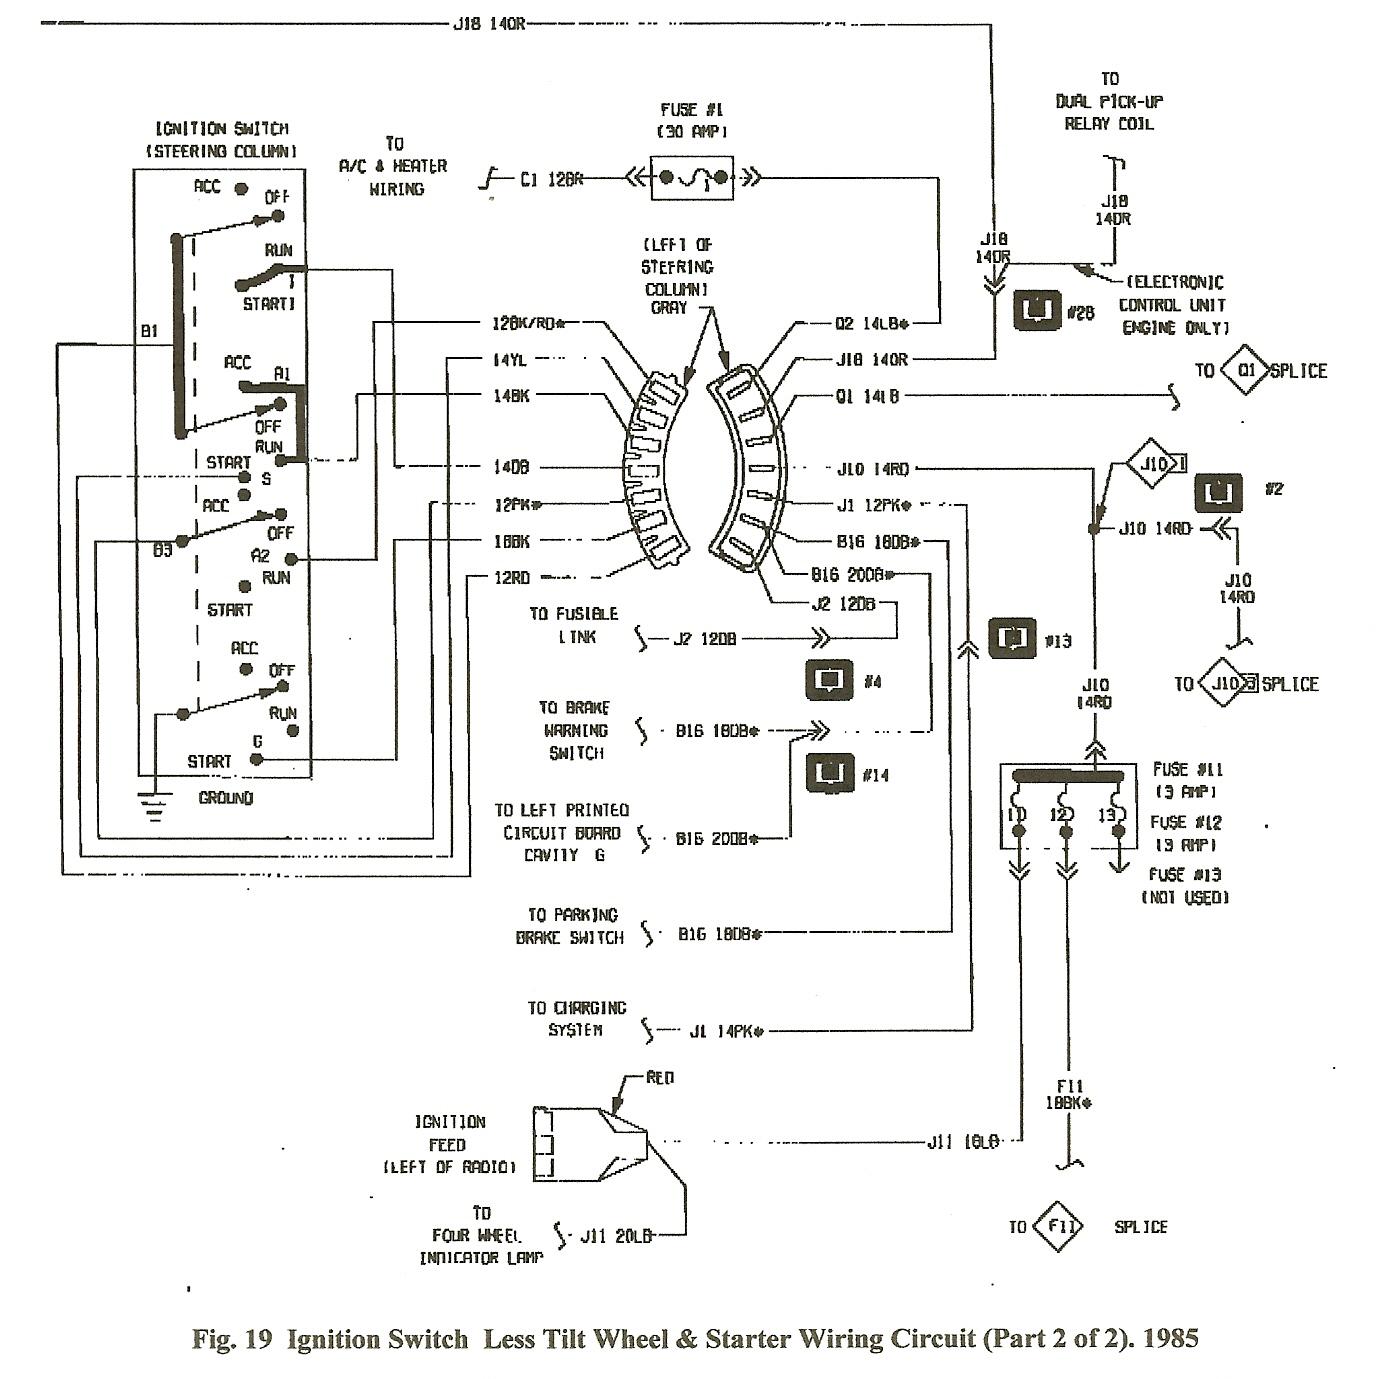 1987 Dodge Ram 150 Wiring Diagram | Manual E-Books - Dodge Ram Wiring Harness Diagram